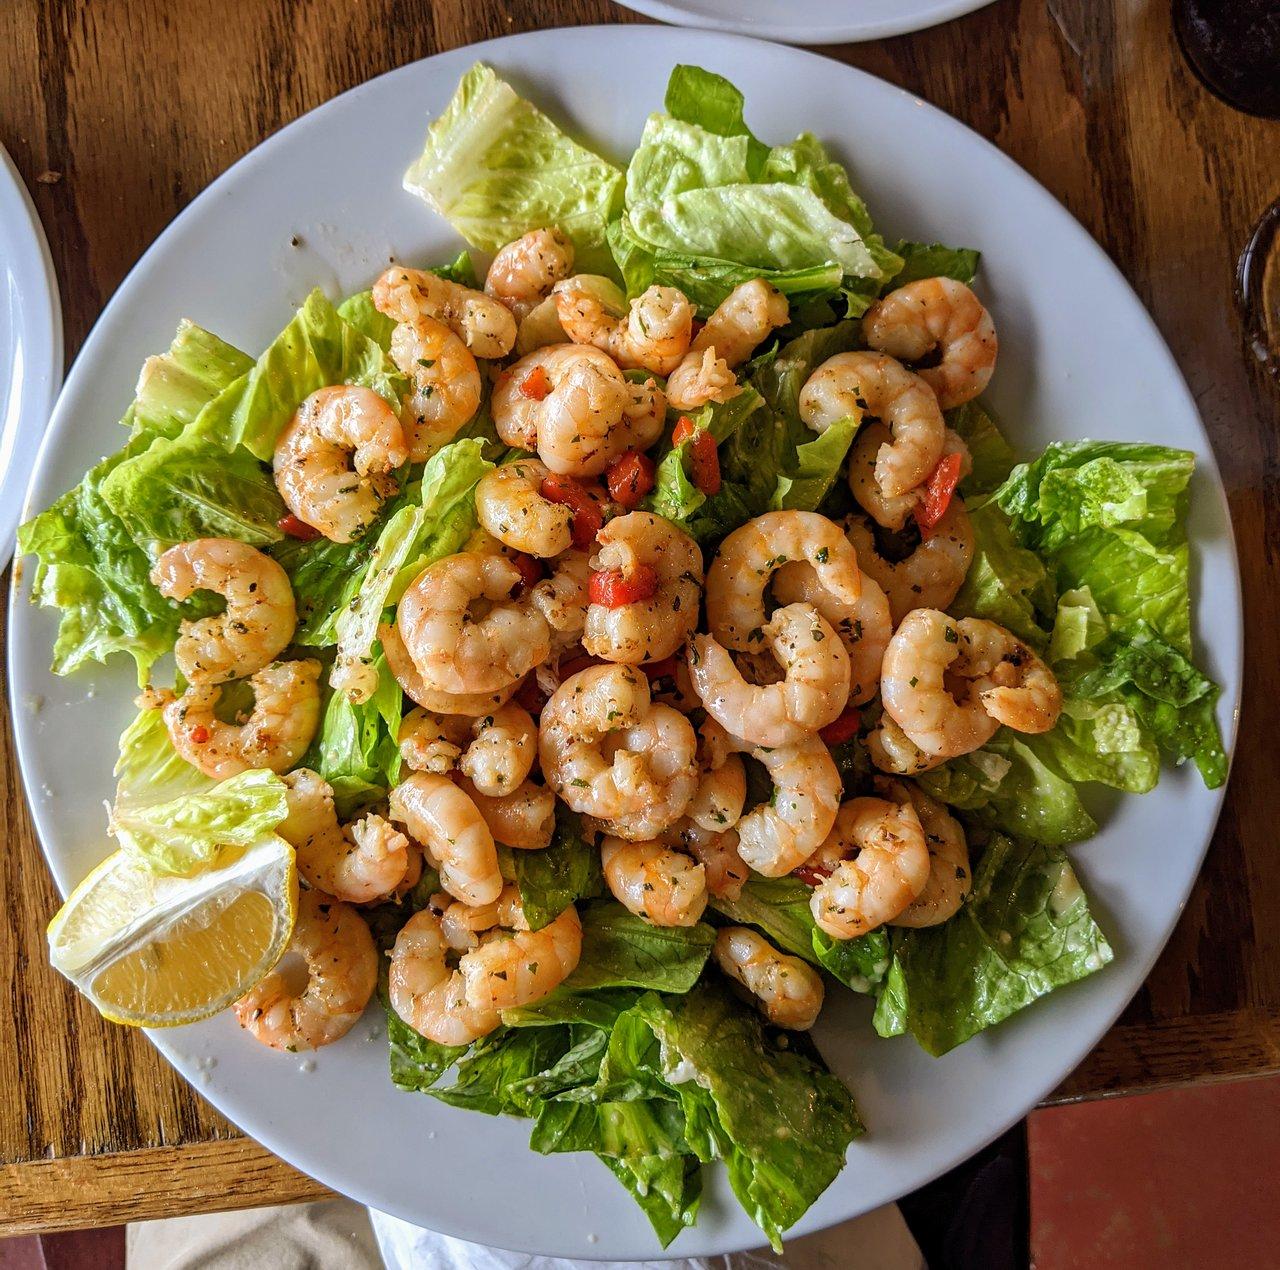 The 10 Best Restaurants In Perth Amboy Updated July 2021 Tripadvisor